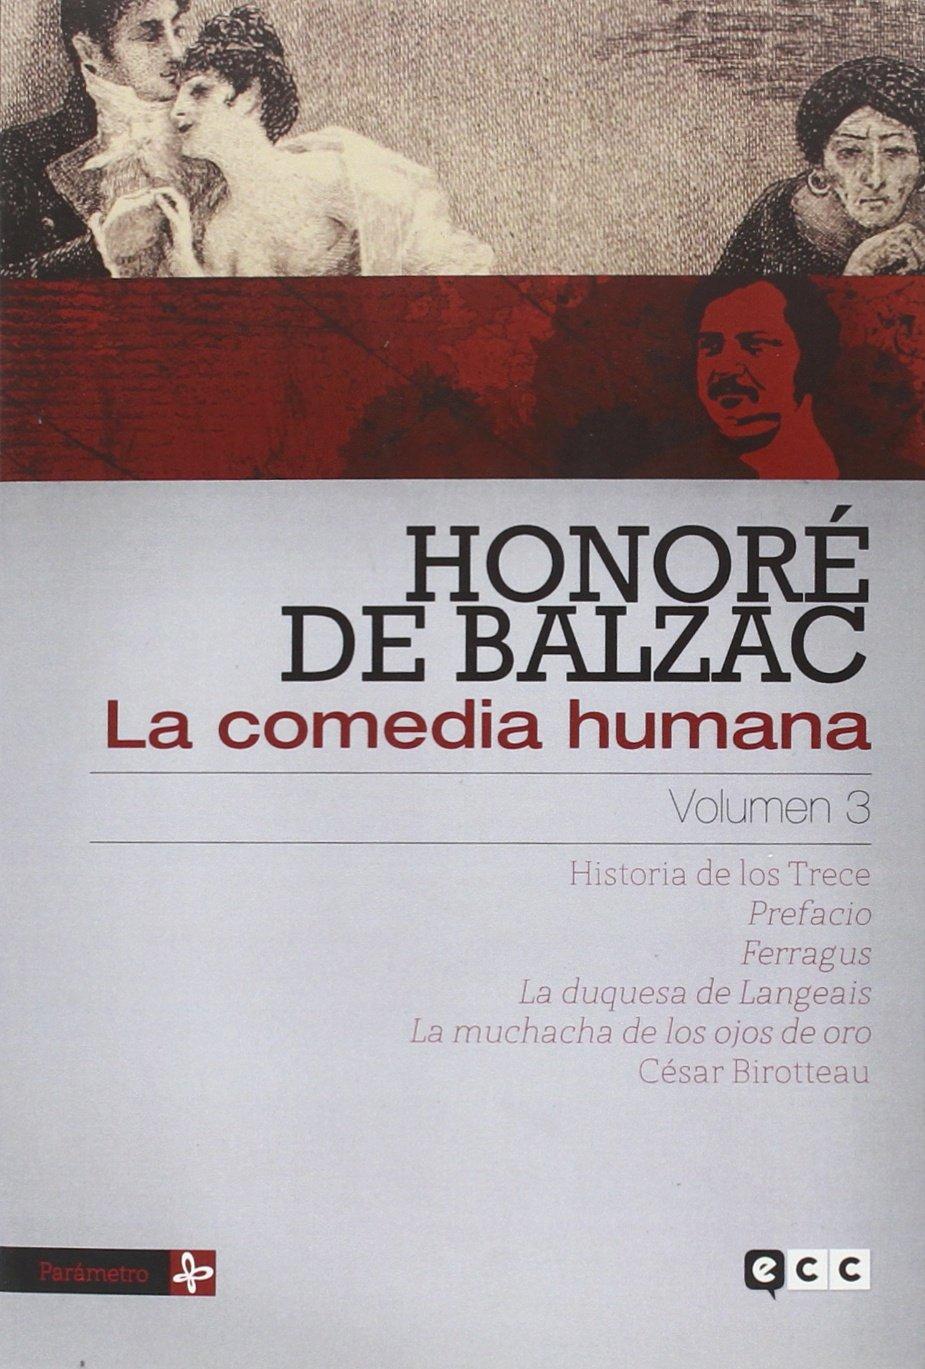 La comedia humana de Balzac completa vol. 3: Amazon.es: Honoré Balzac: Libros